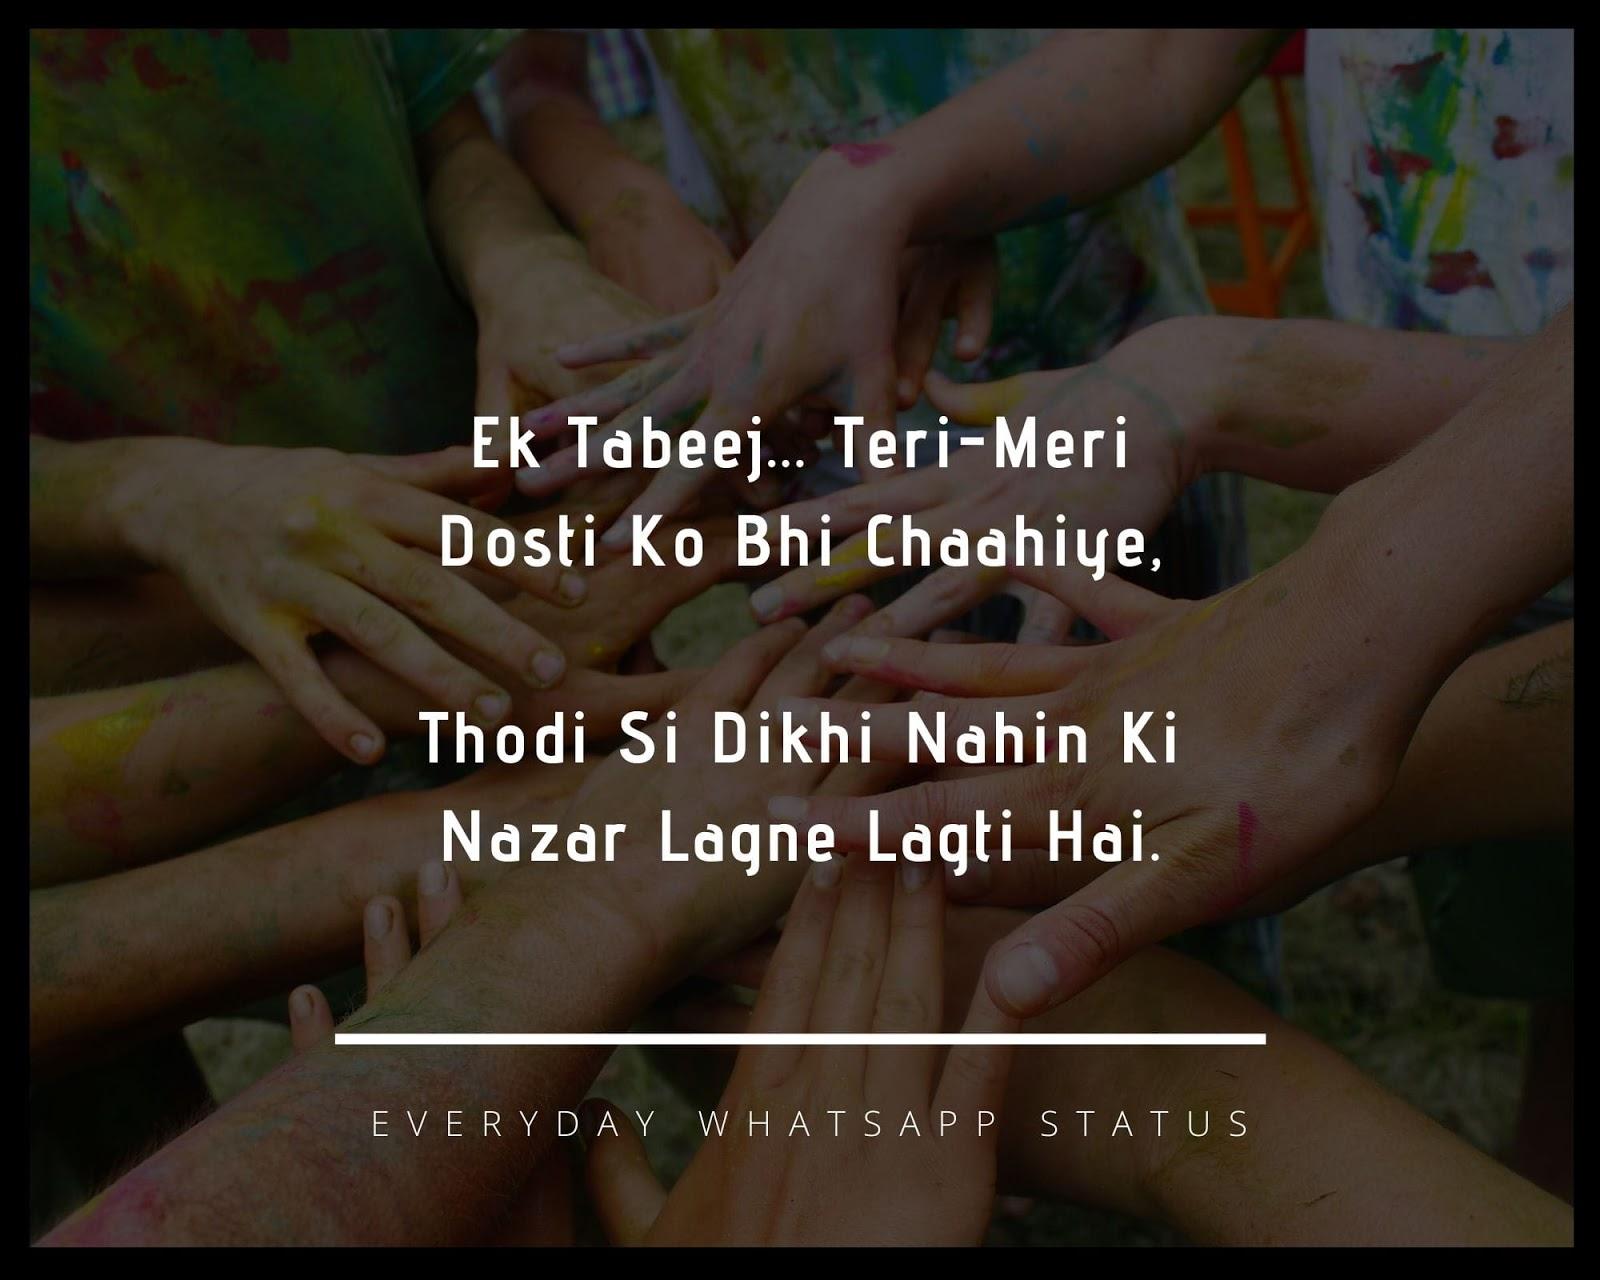 Dosti Shayari Funny - Ek Tabeej Teri-Meri